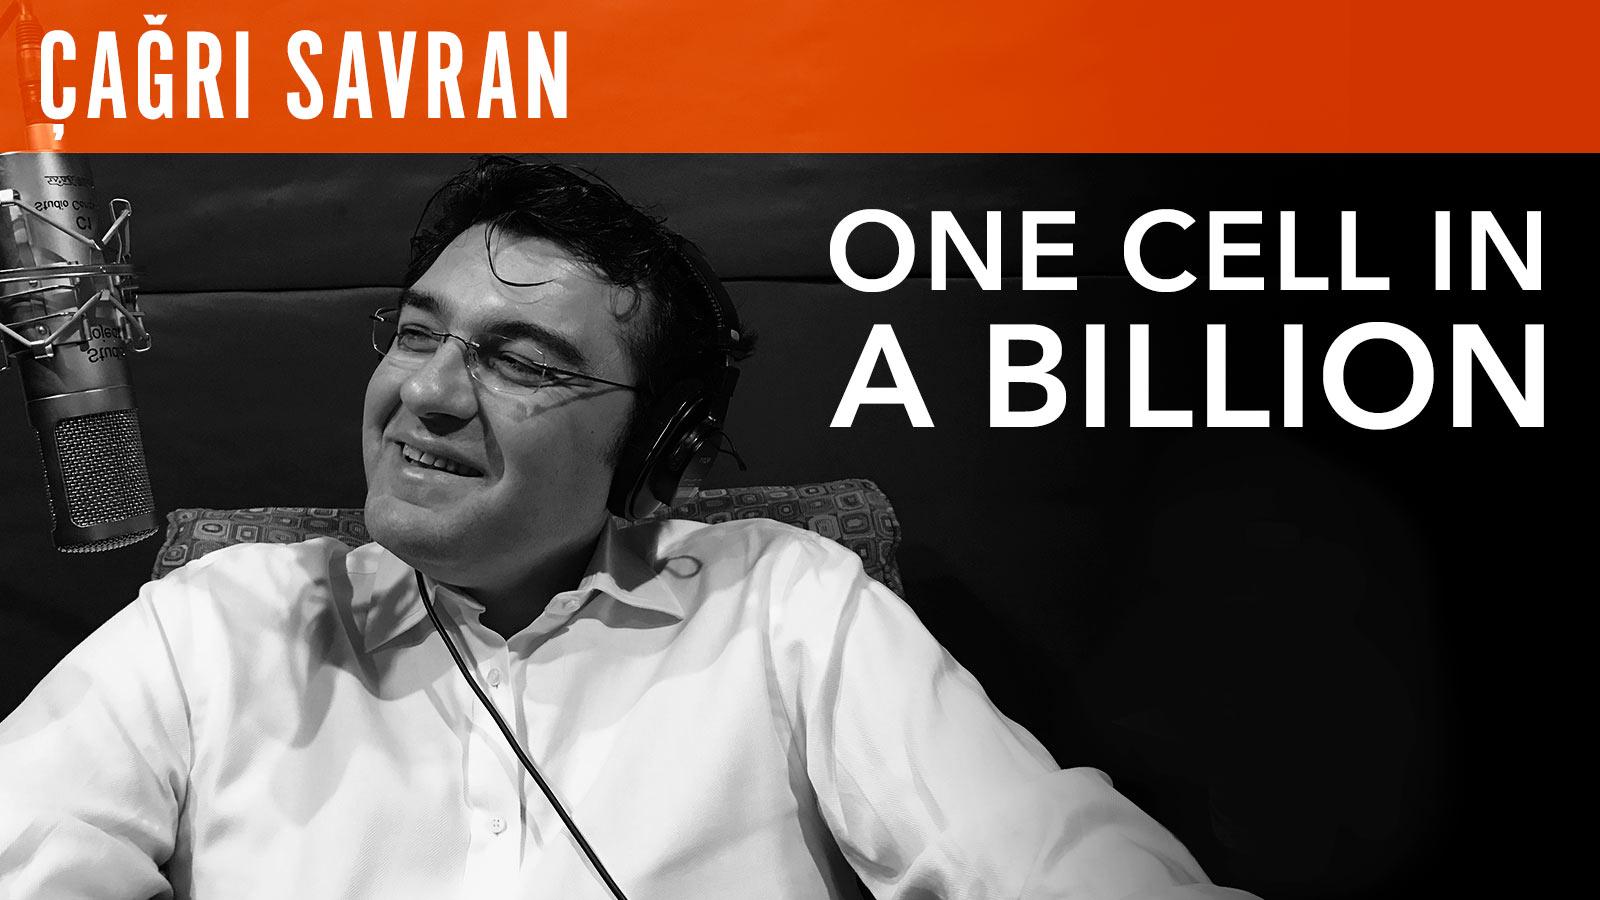 Cagri Savran  One Cell in a Billion